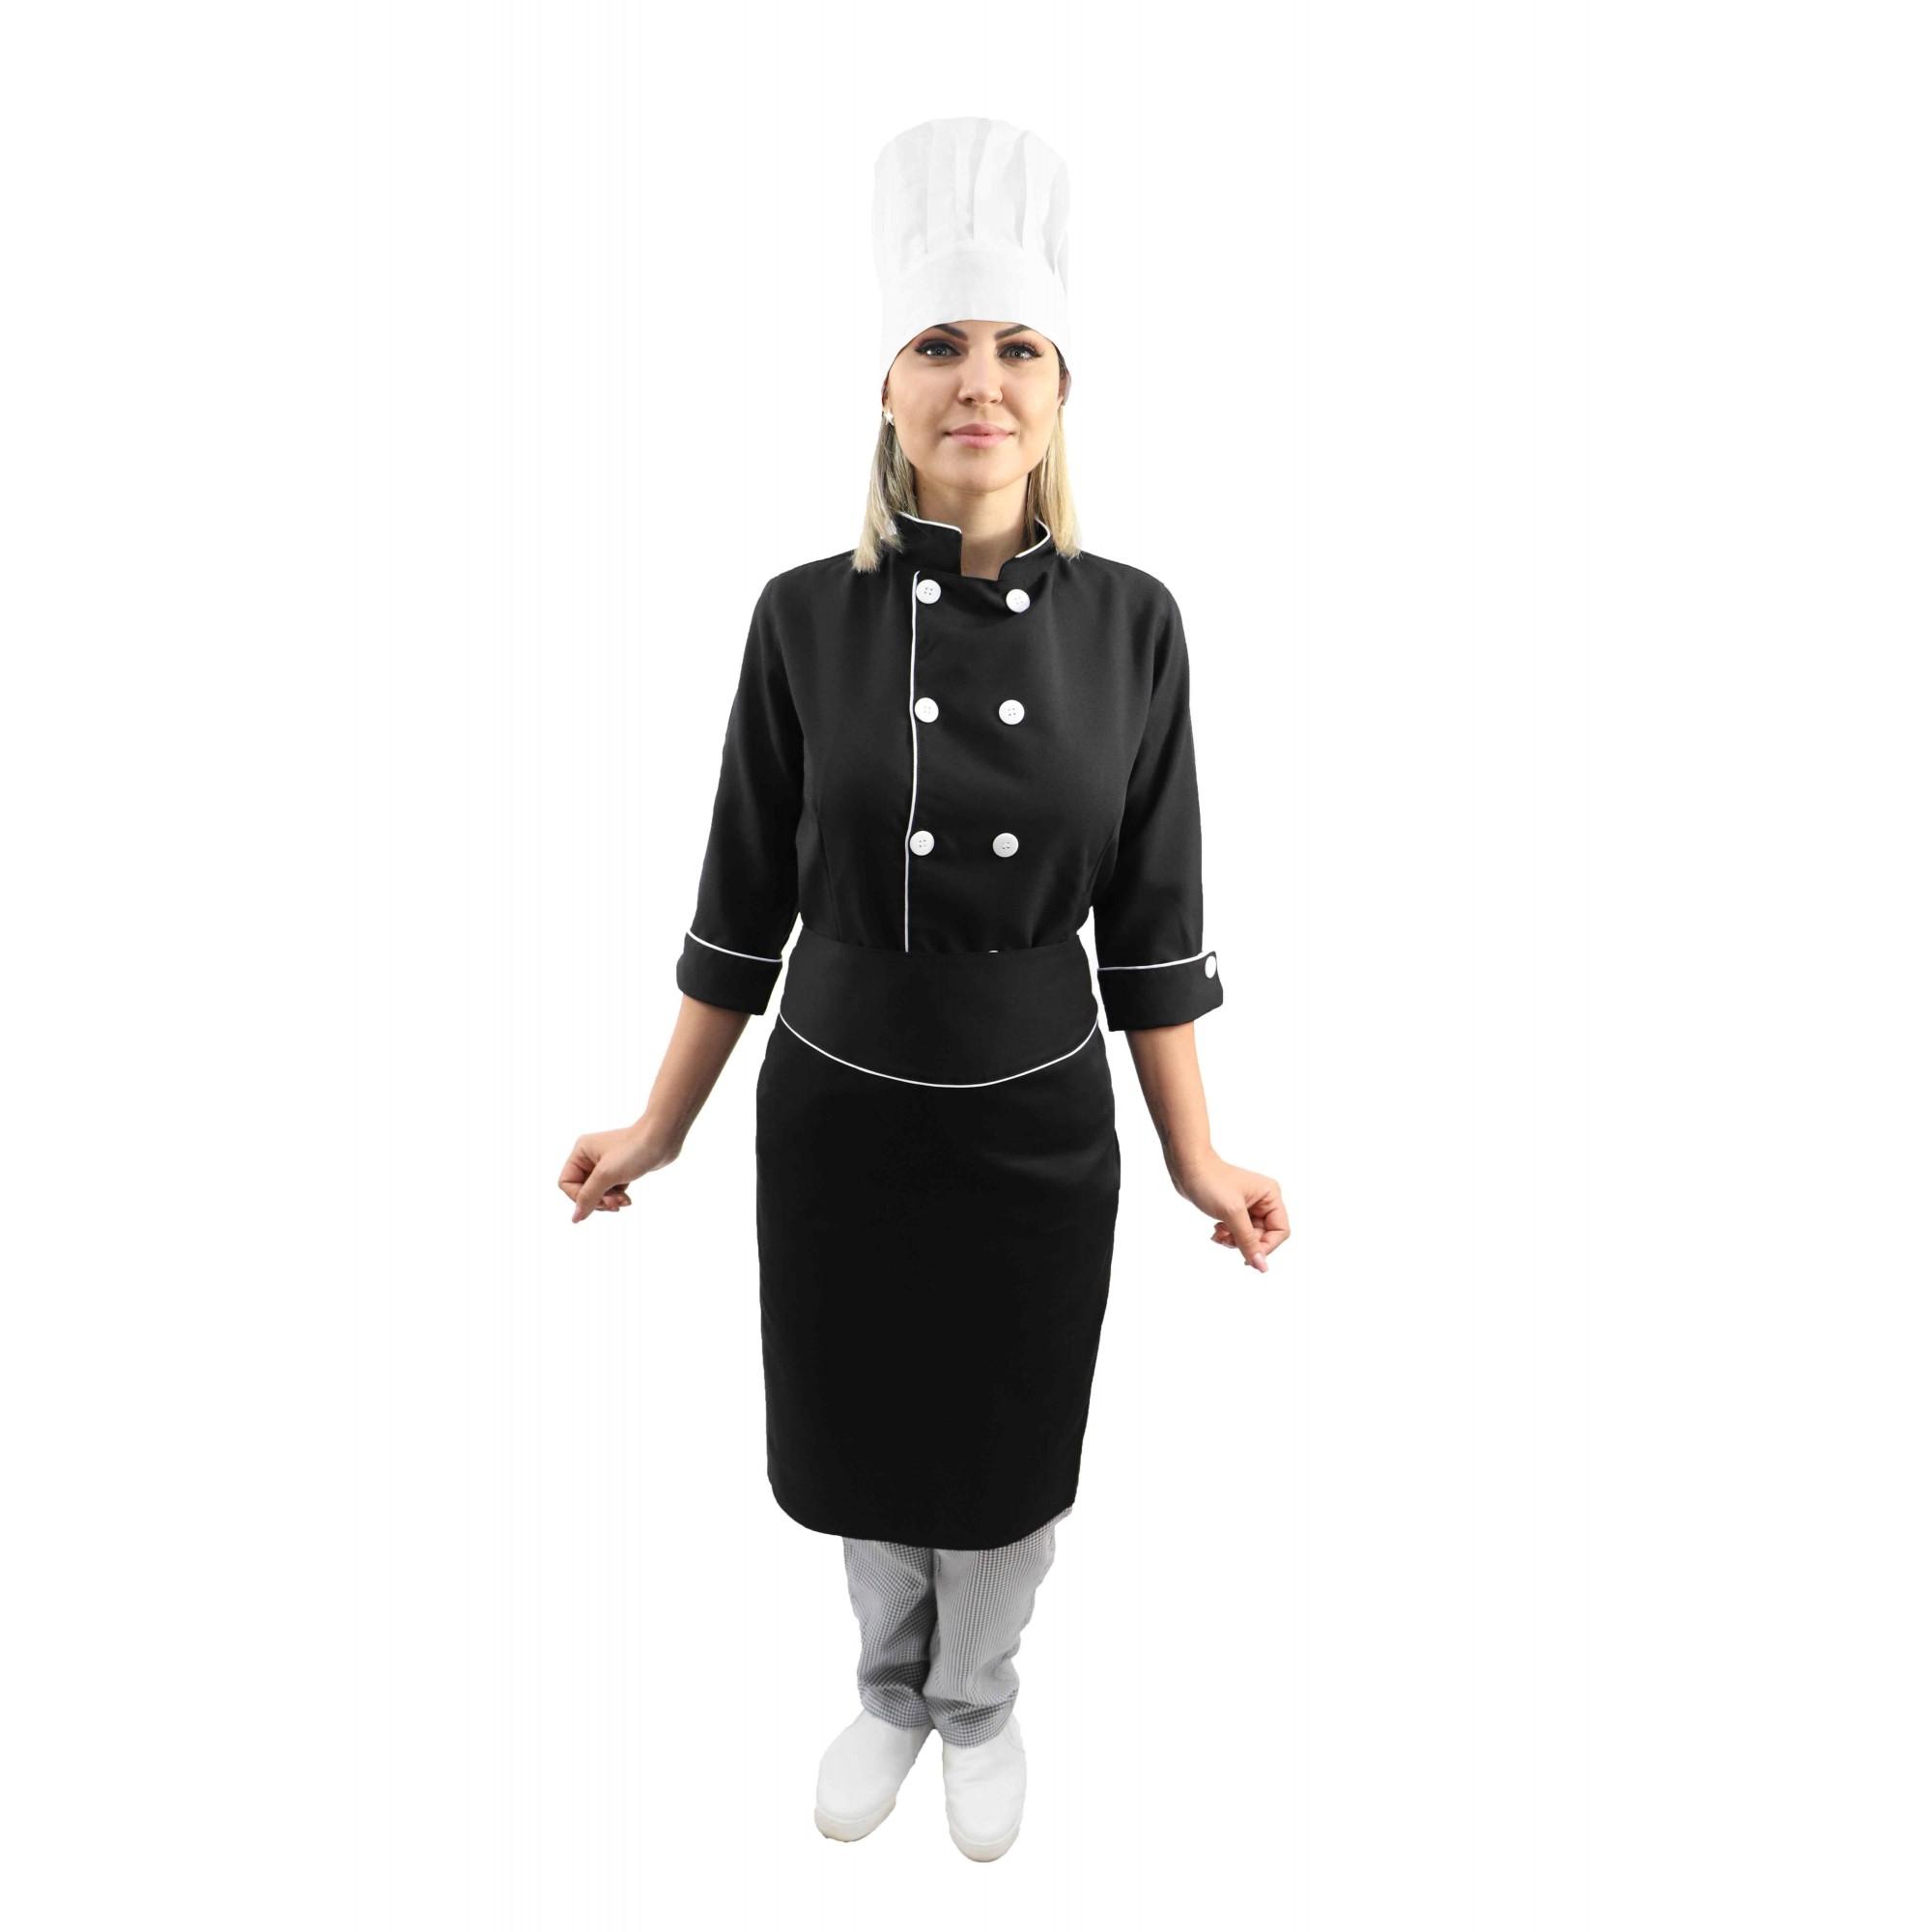 Kit chef cozinha feminino Dolmã manga 3/4 + Avental preto + Chapéu branco